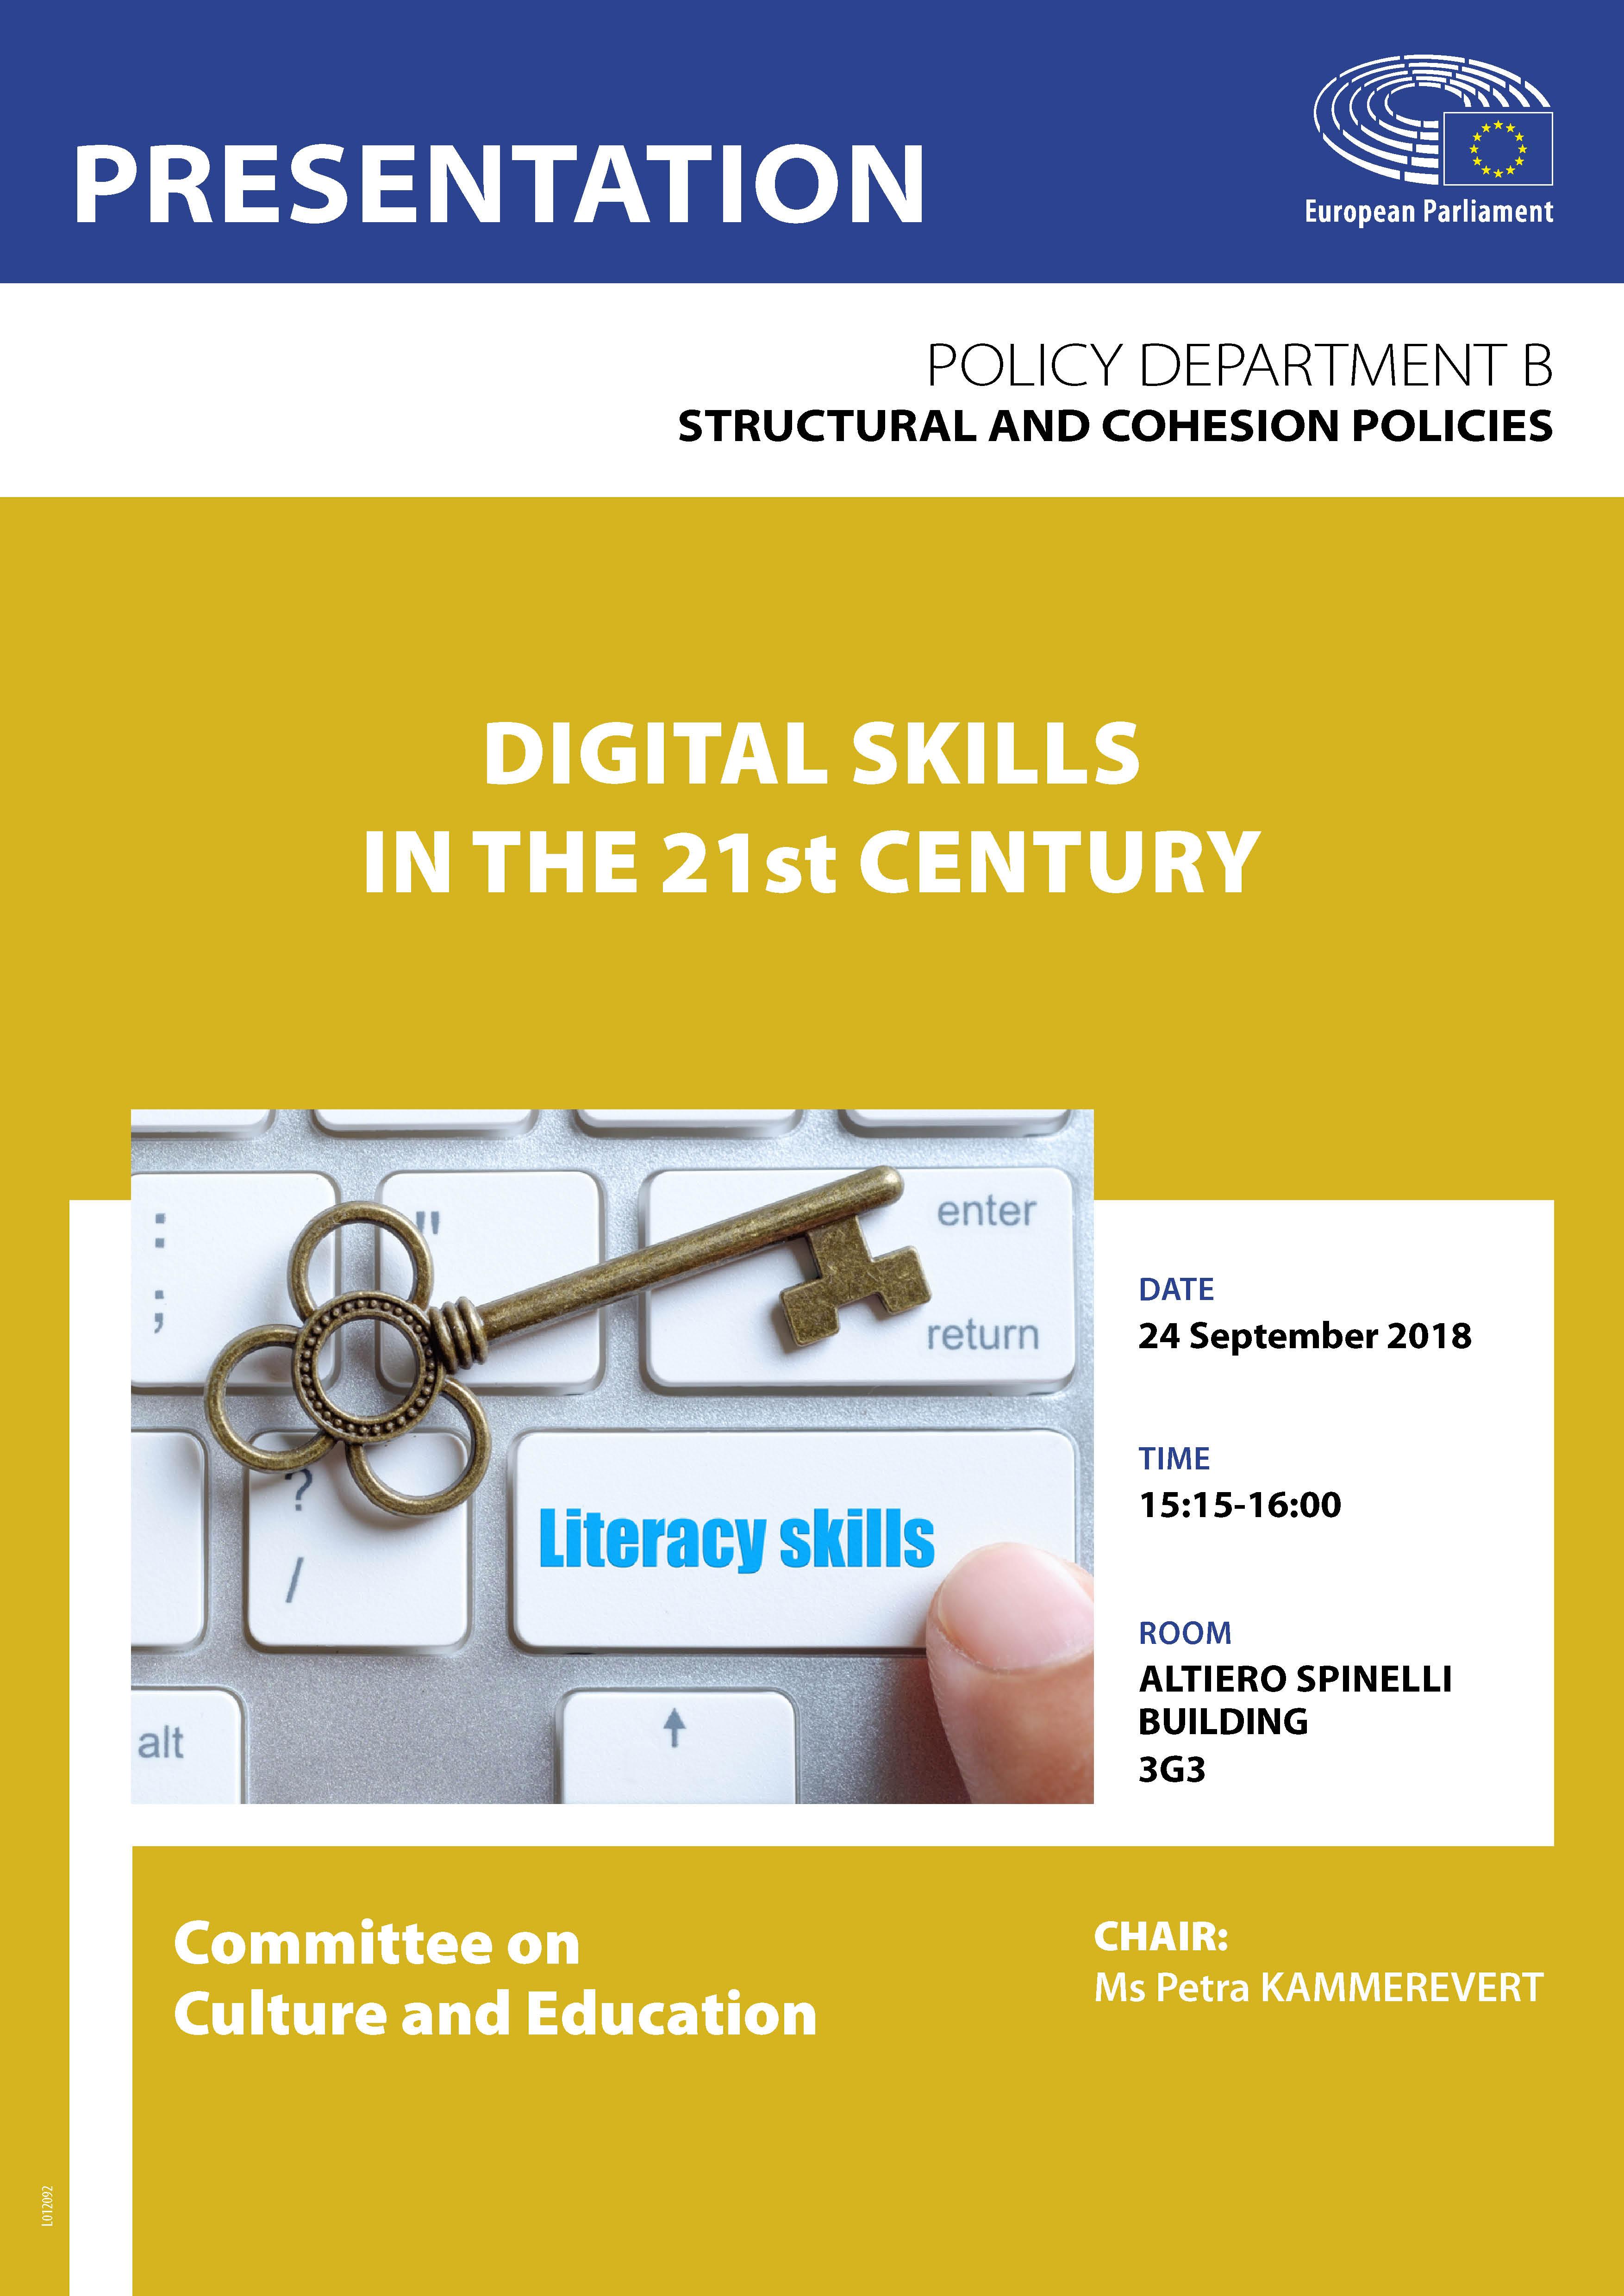 Digital skills in the 21st century